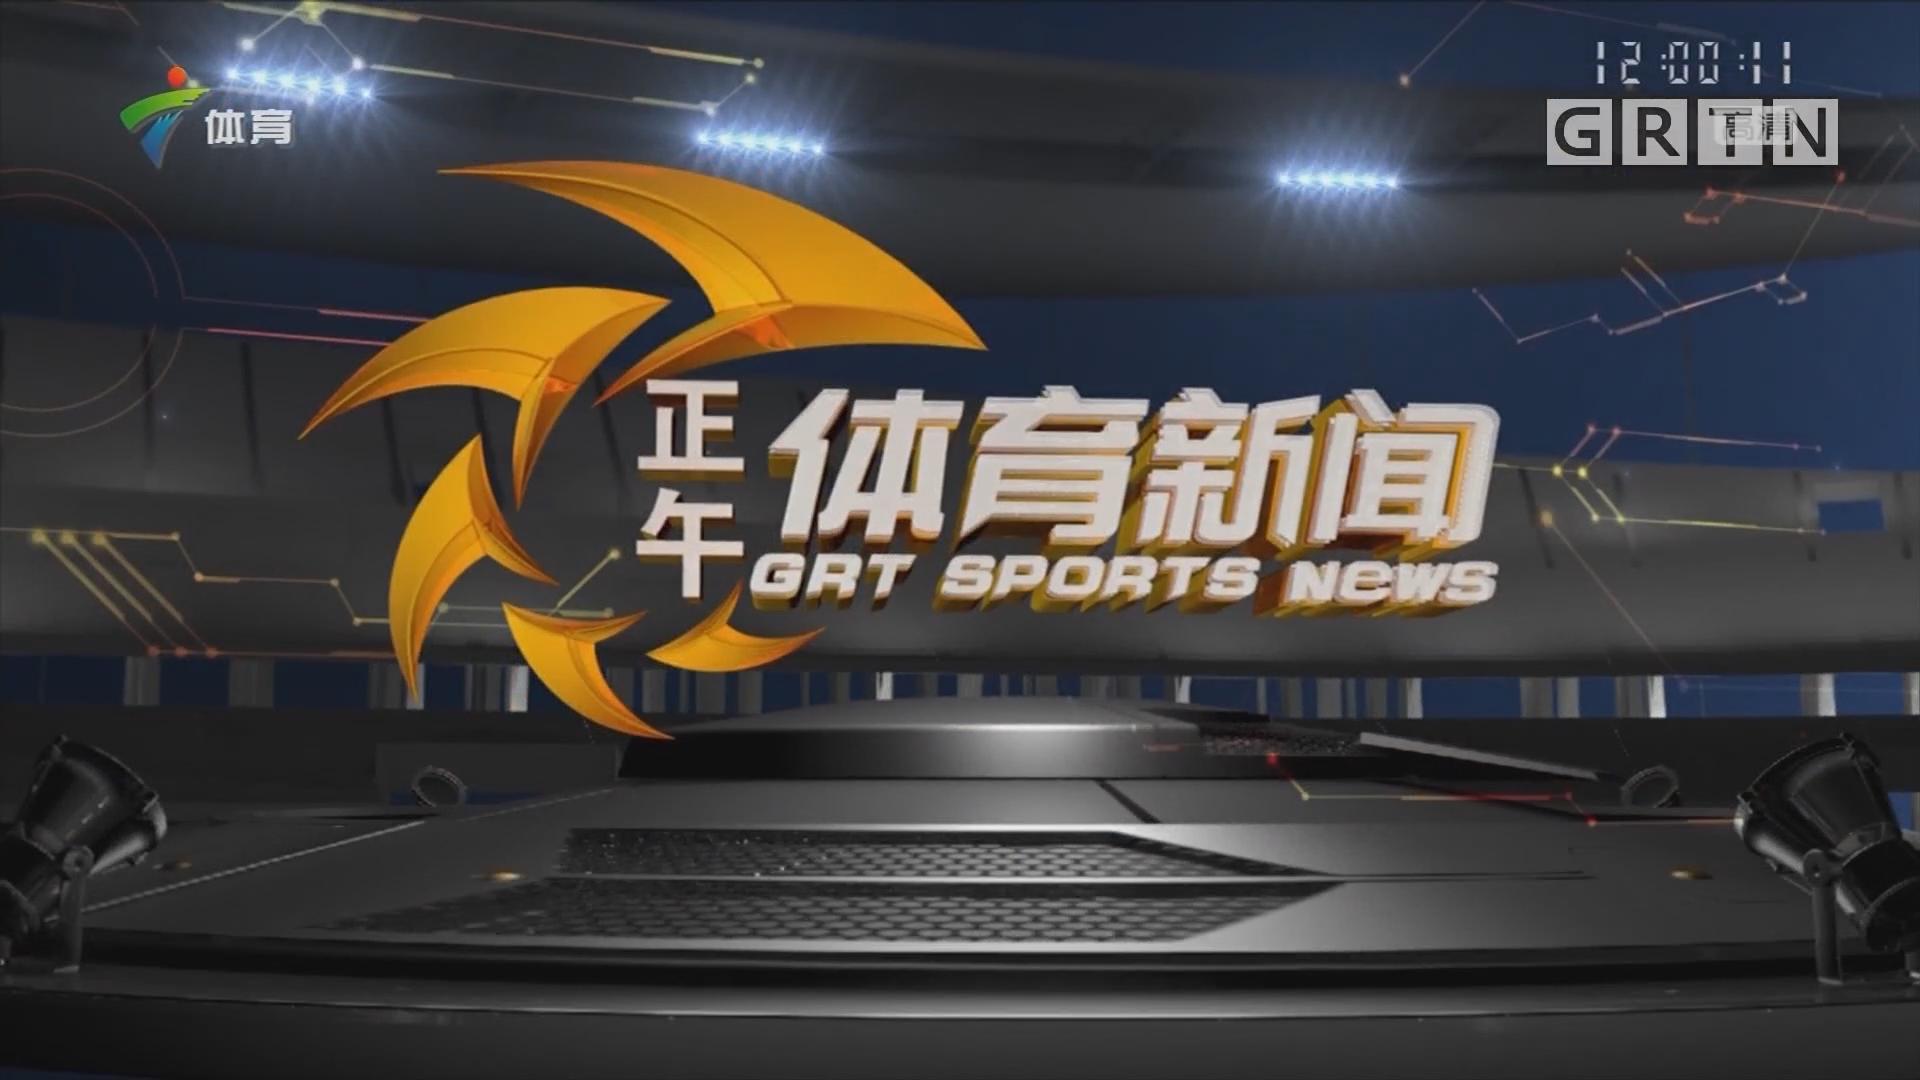 [HD][2018-11-05]正午体育新闻:[HD][2018-11-05]正午体育新闻: